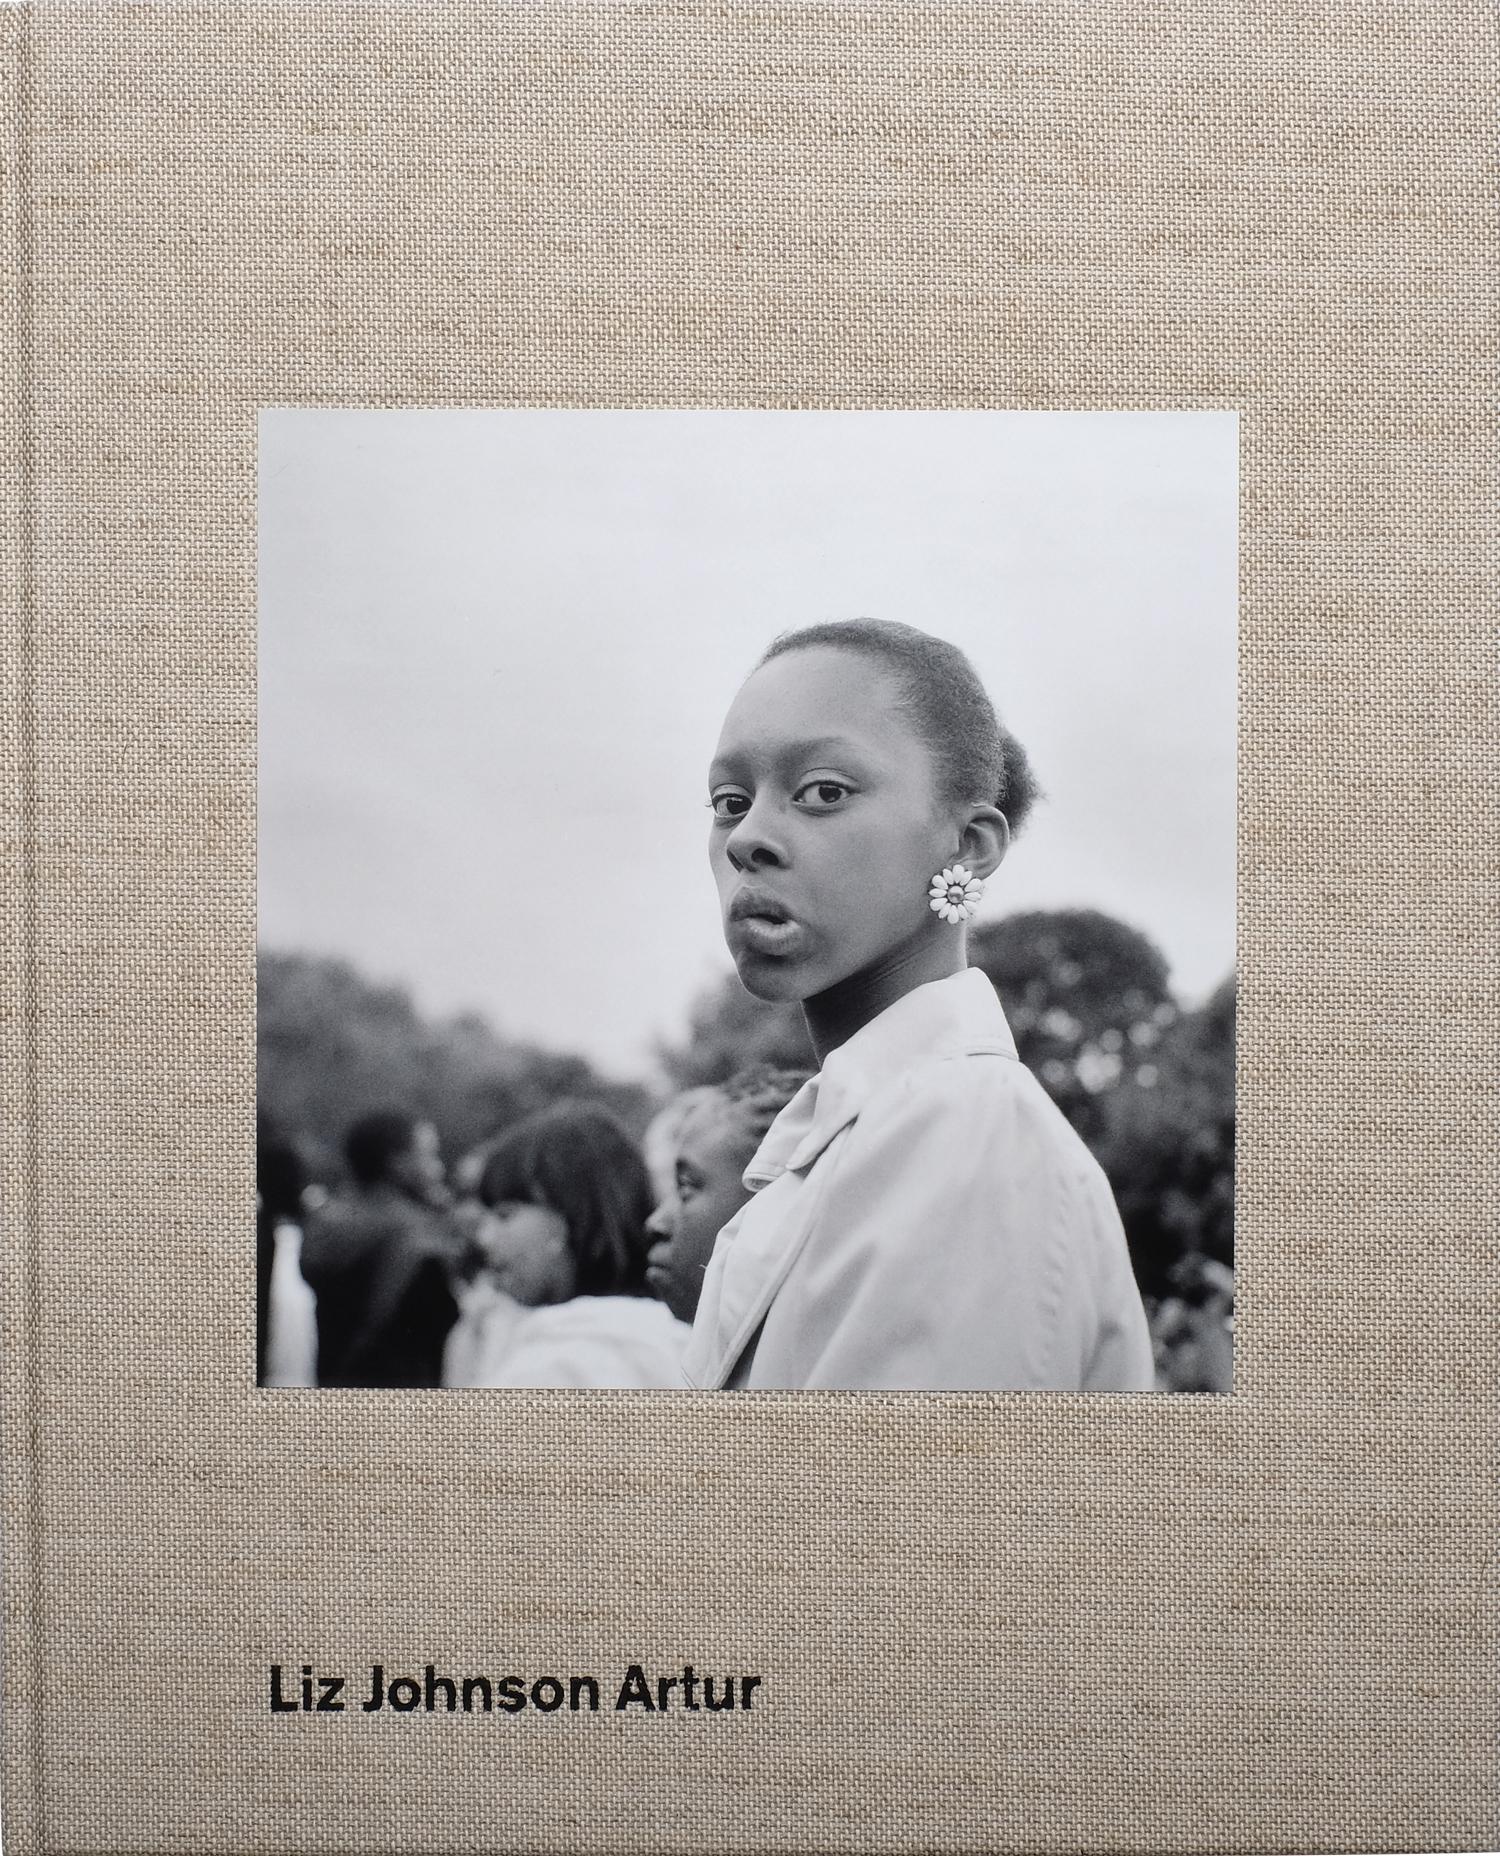 71-Artur-LizJohnsonArtur-cover-web.jpg